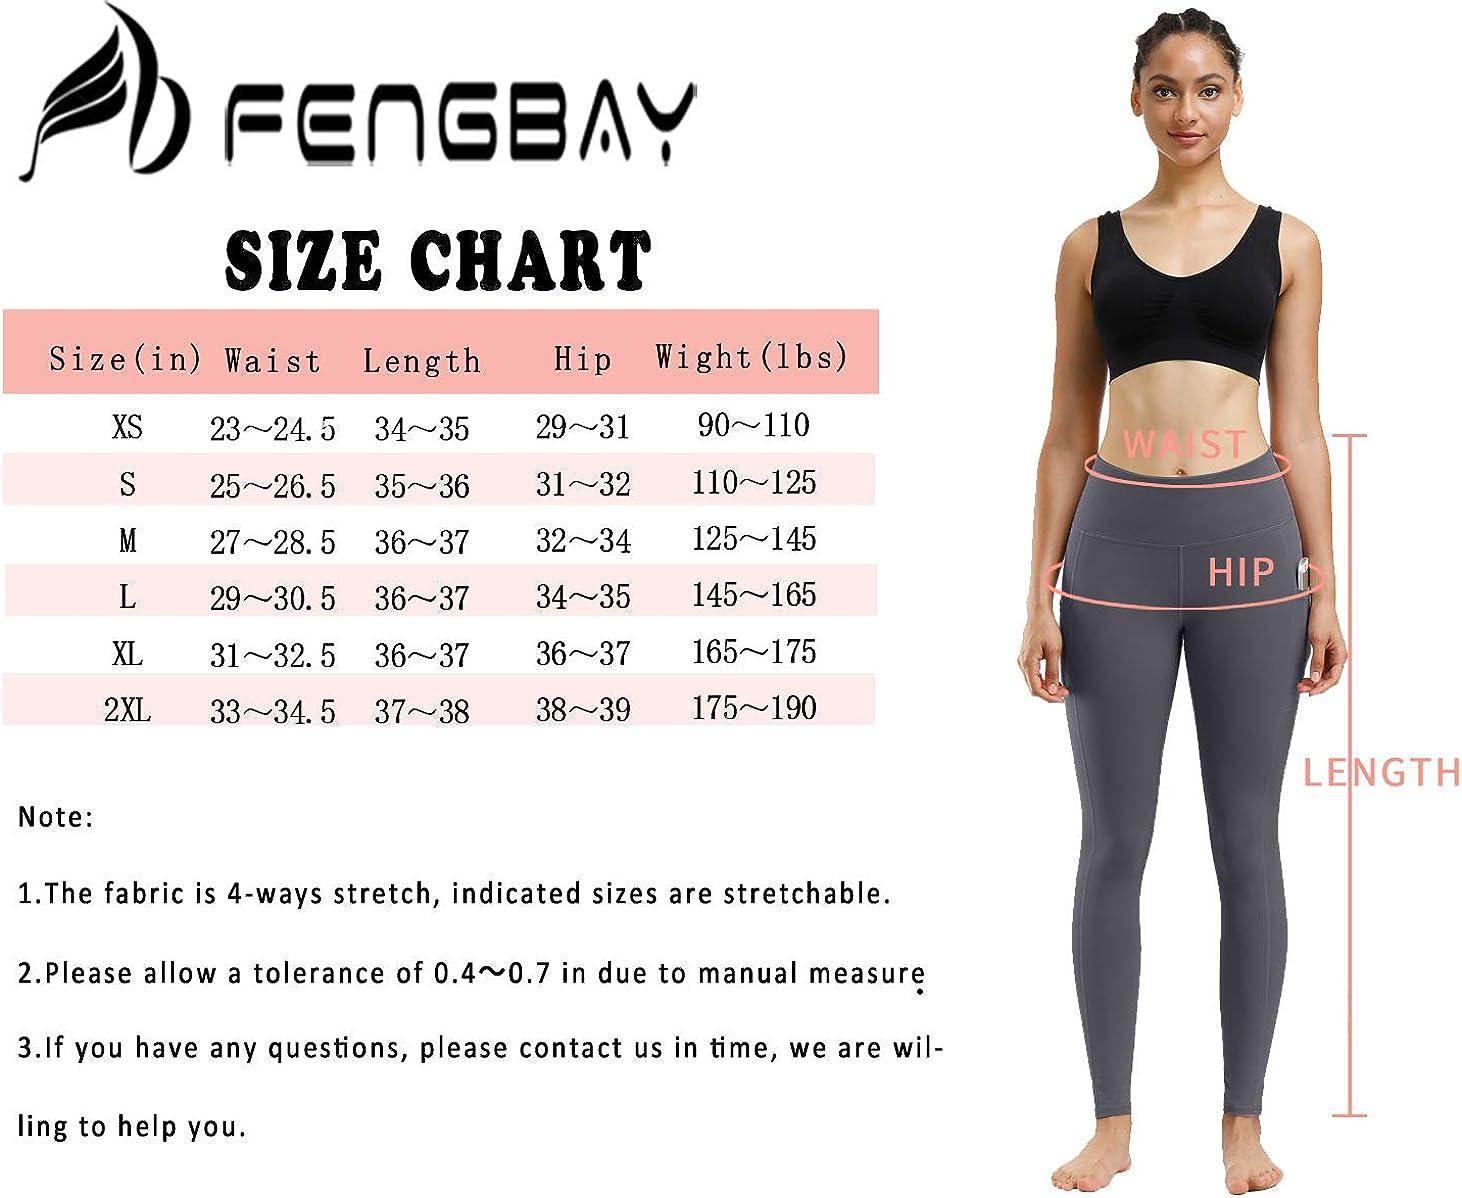 Fengbay 2 Pack High Waist Yoga Pants, Pocket Yoga Pants Tummy Control Workout Running 4 Way Stretch Yoga Leggings: Clothing